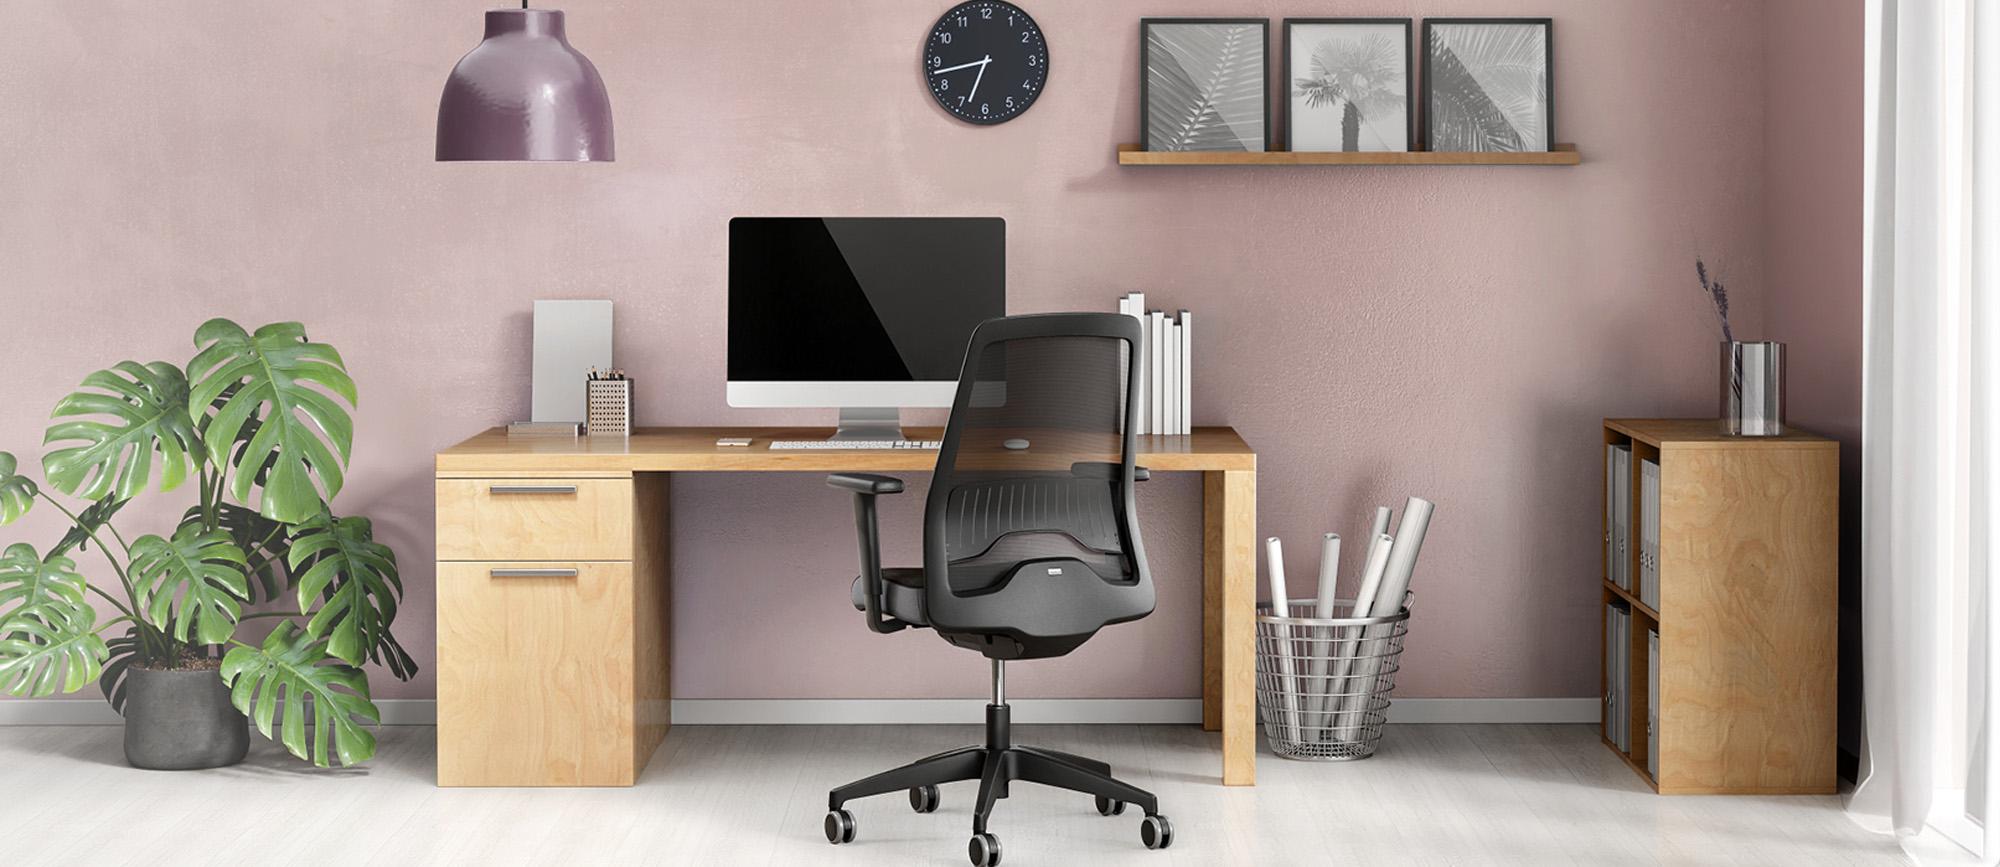 Interstuhl Office Chairs